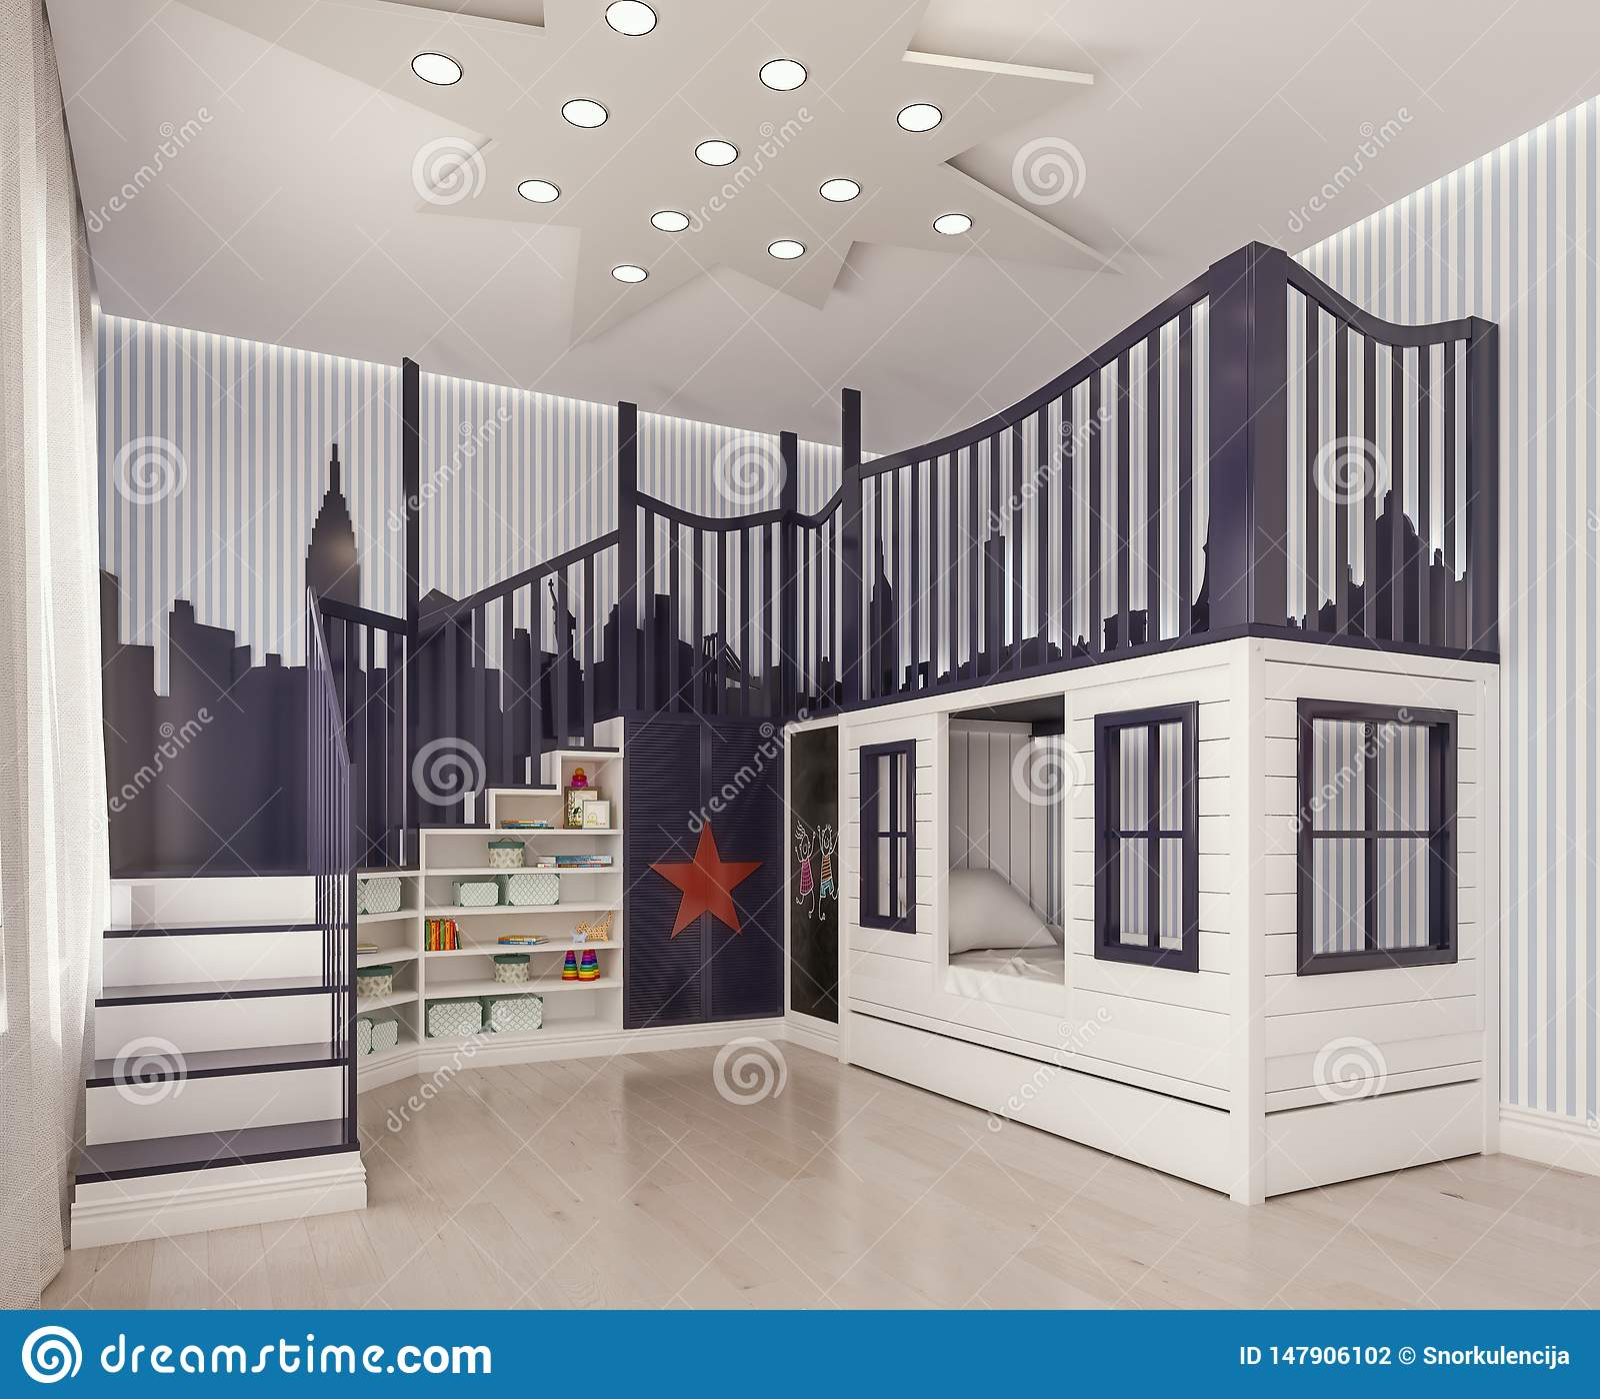 Modern Interior Design Kids Bedroom Children Room Playroom With